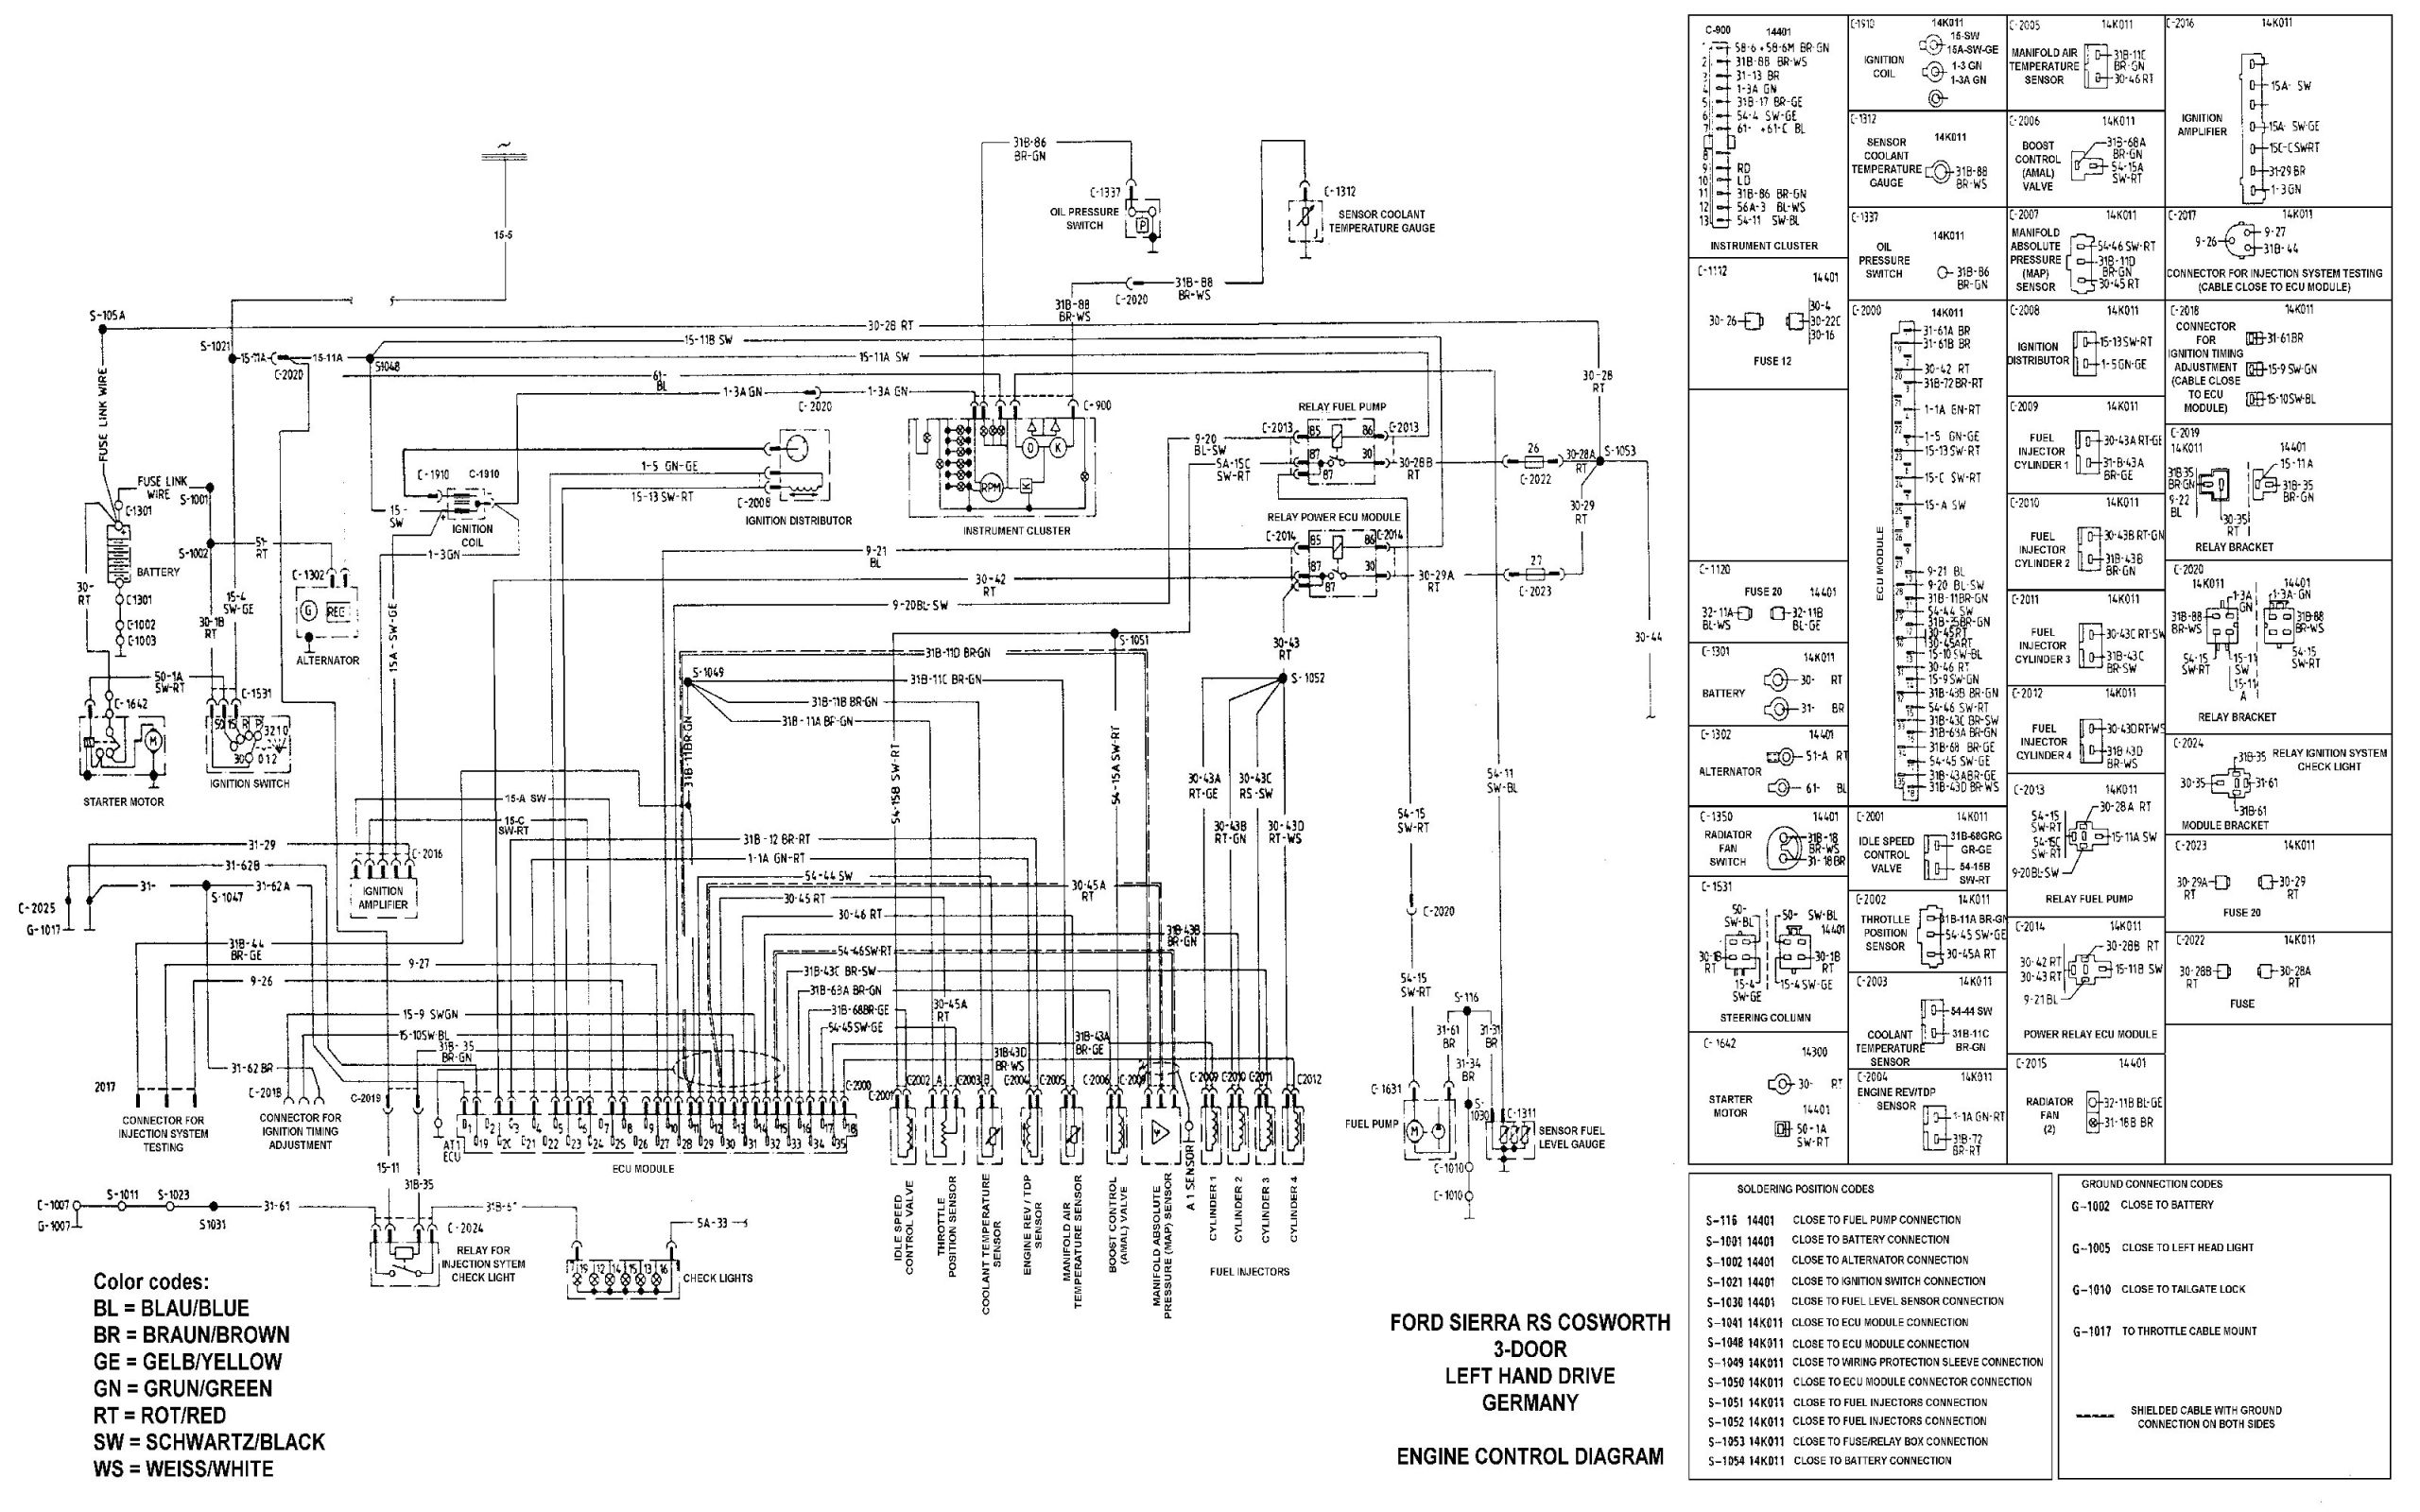 2006 ford focus engine diagram 2011 ford fiesta engine diagram best ford fiesta mk7 od 2008 roku of 2006 ford focus engine diagram 1 jpg